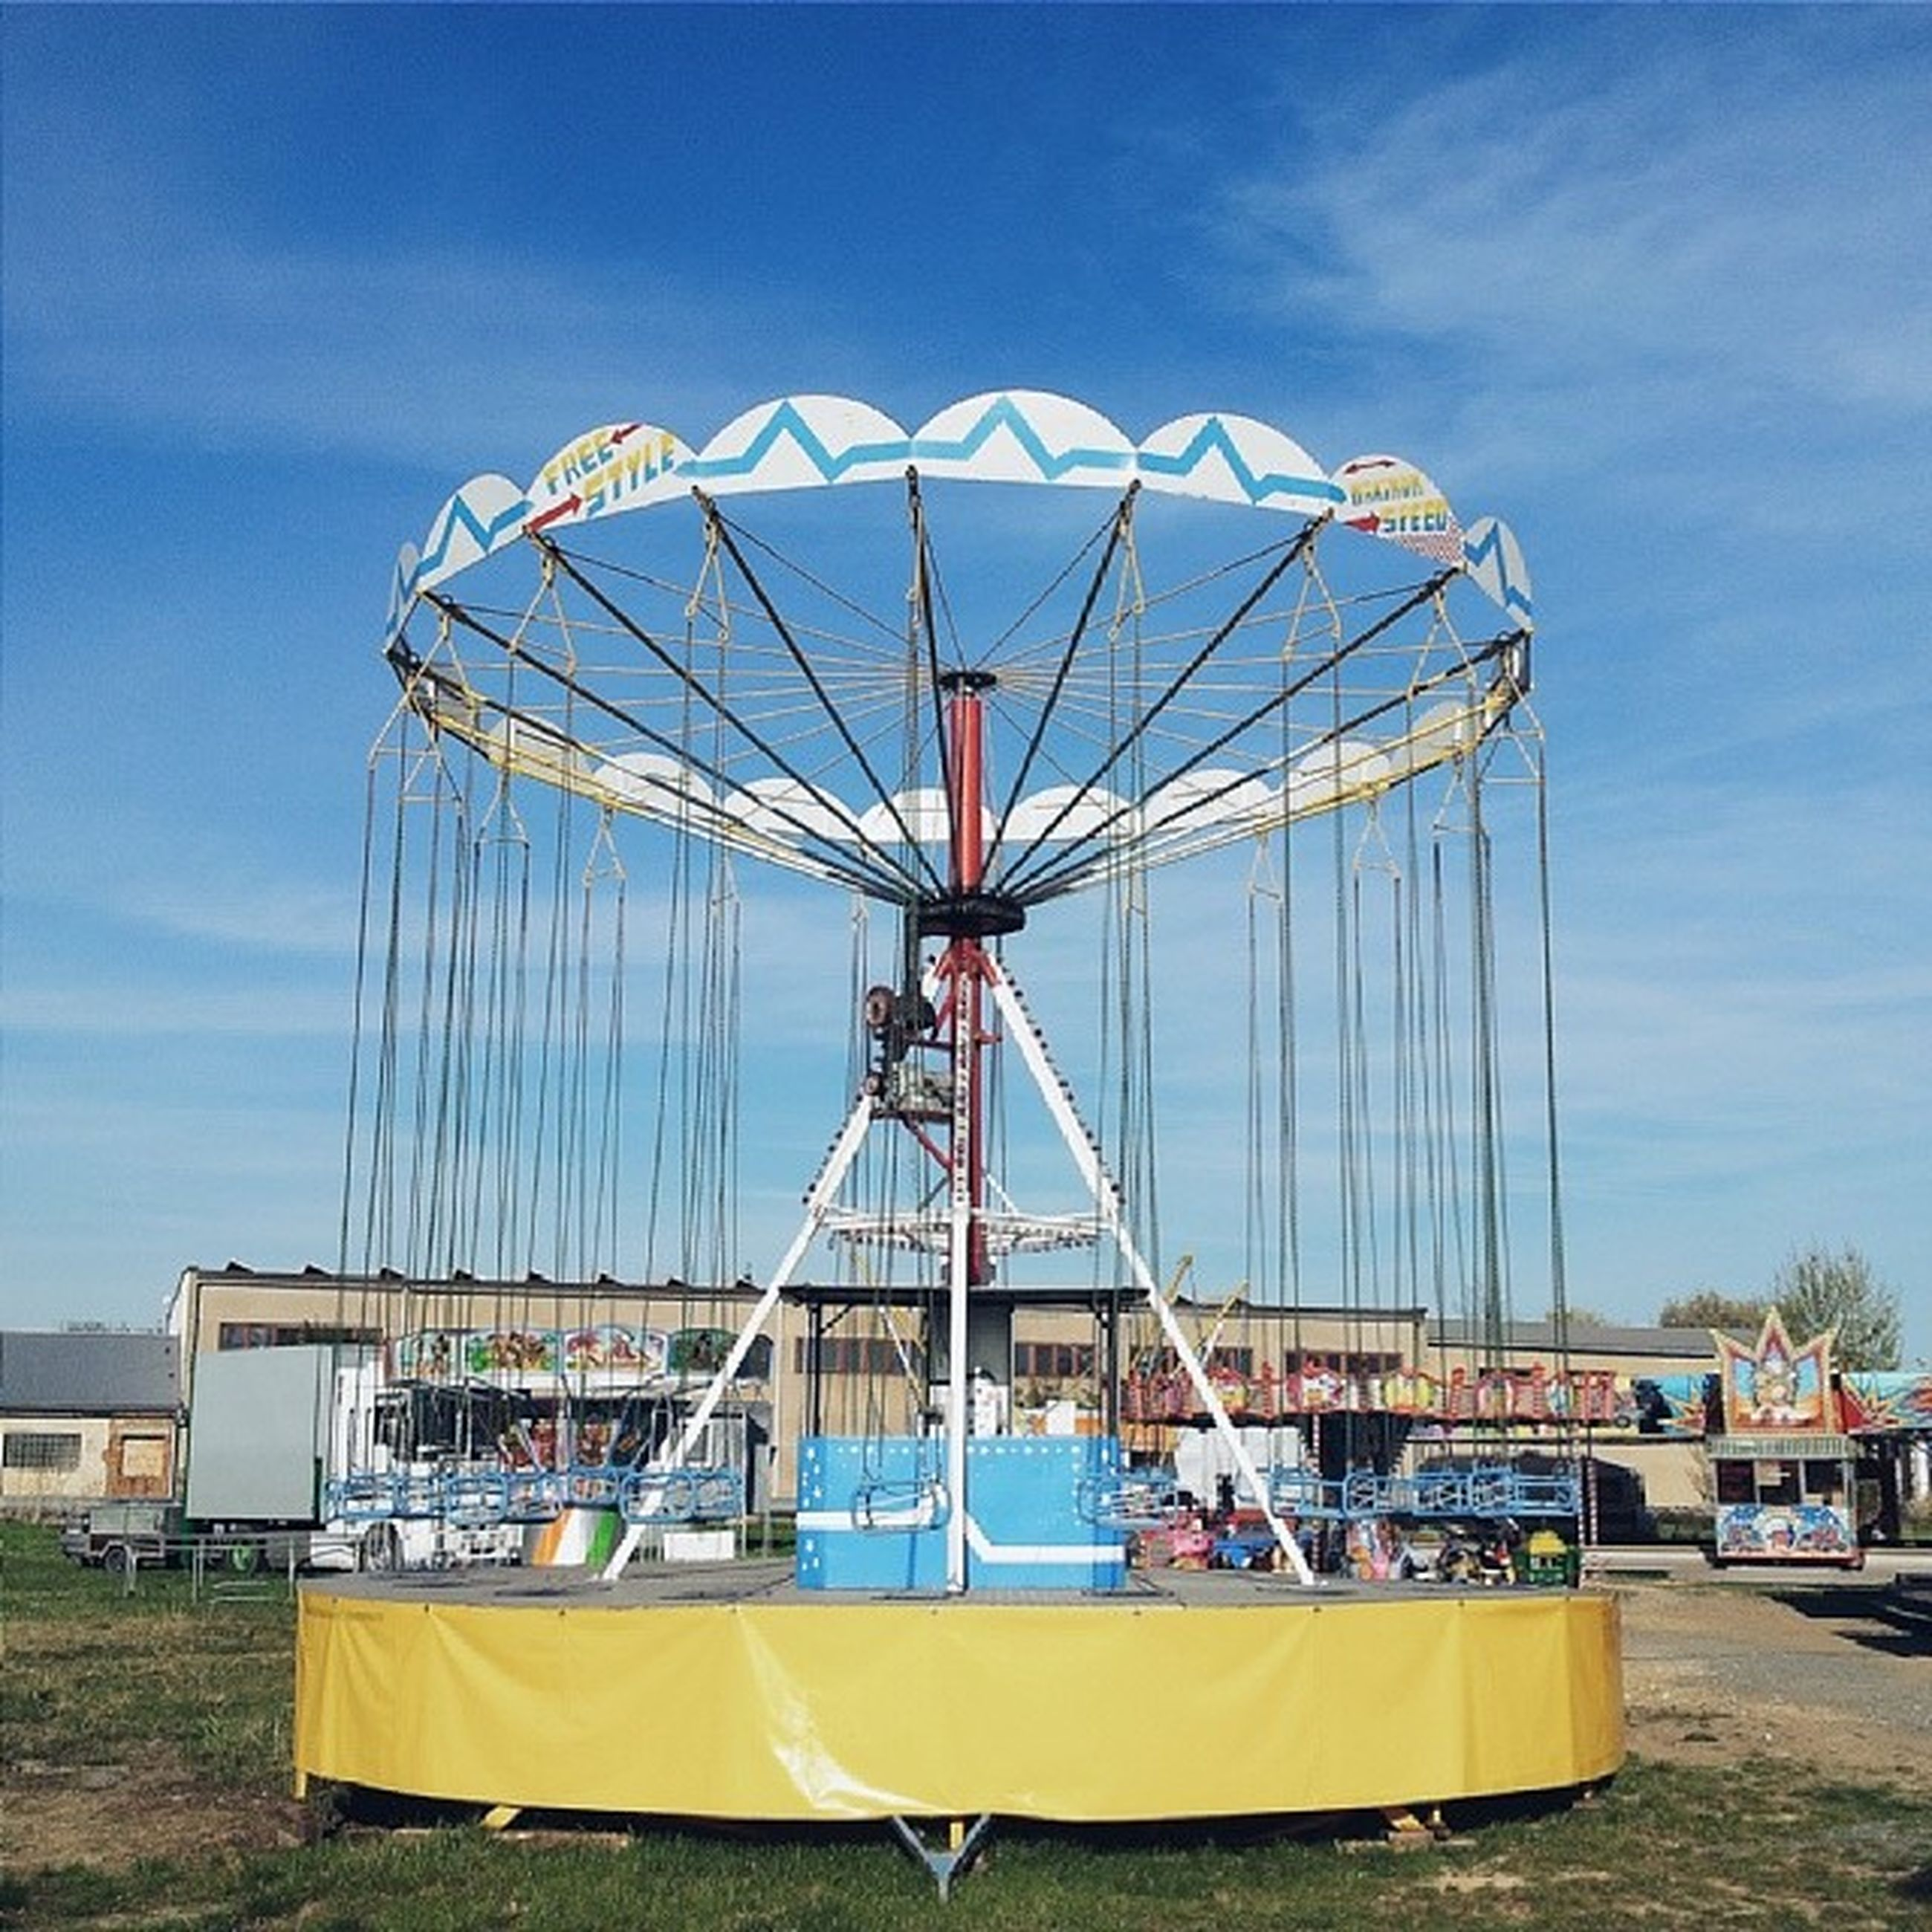 amusement park, amusement park ride, ferris wheel, sky, arts culture and entertainment, low angle view, blue, fun, cloud - sky, day, outdoors, built structure, enjoyment, sunlight, metal, cloud, leisure activity, beach, incidental people, no people